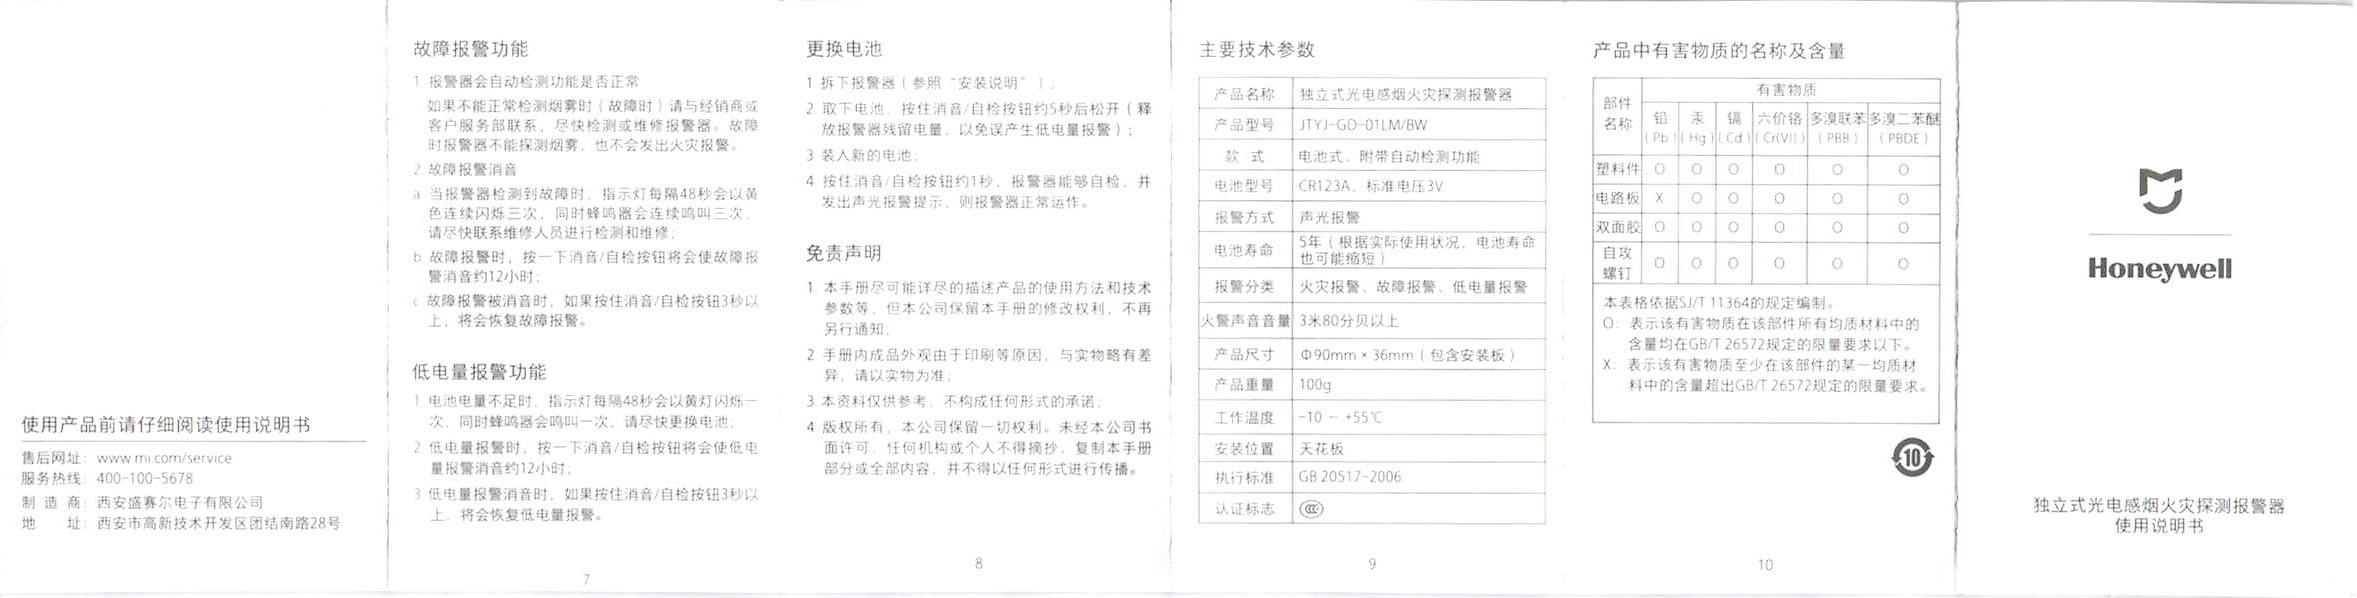 Xiaomi MiHome Honeywell Fire Smoke Alarm Detector Remote Alert Photoelectric Smoke Sensor4